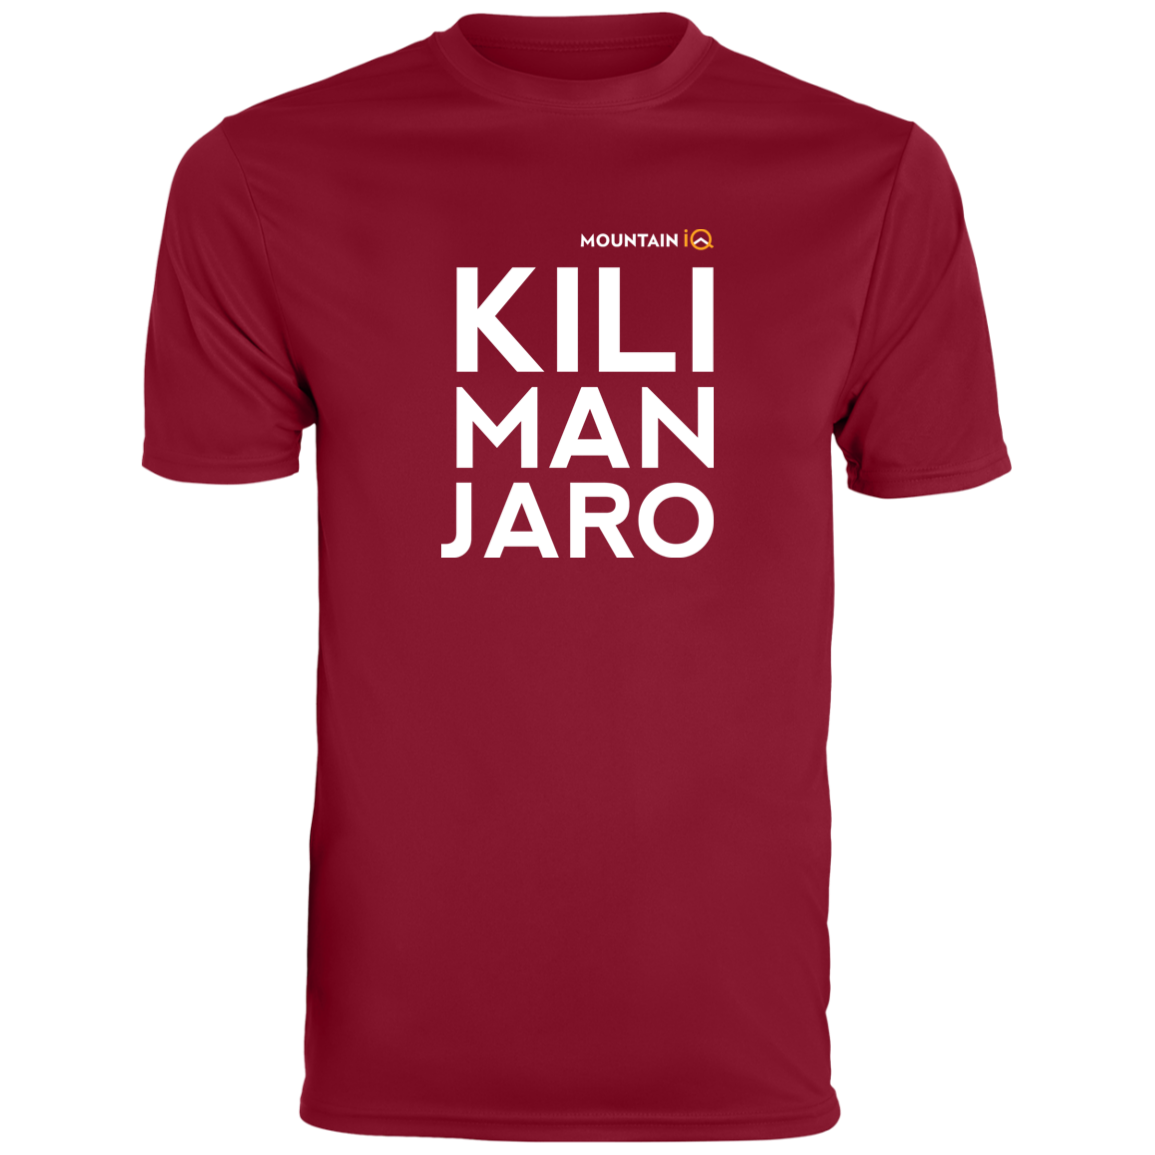 Kilimanjaro Mens T-Shirt Maroon MountainIQ